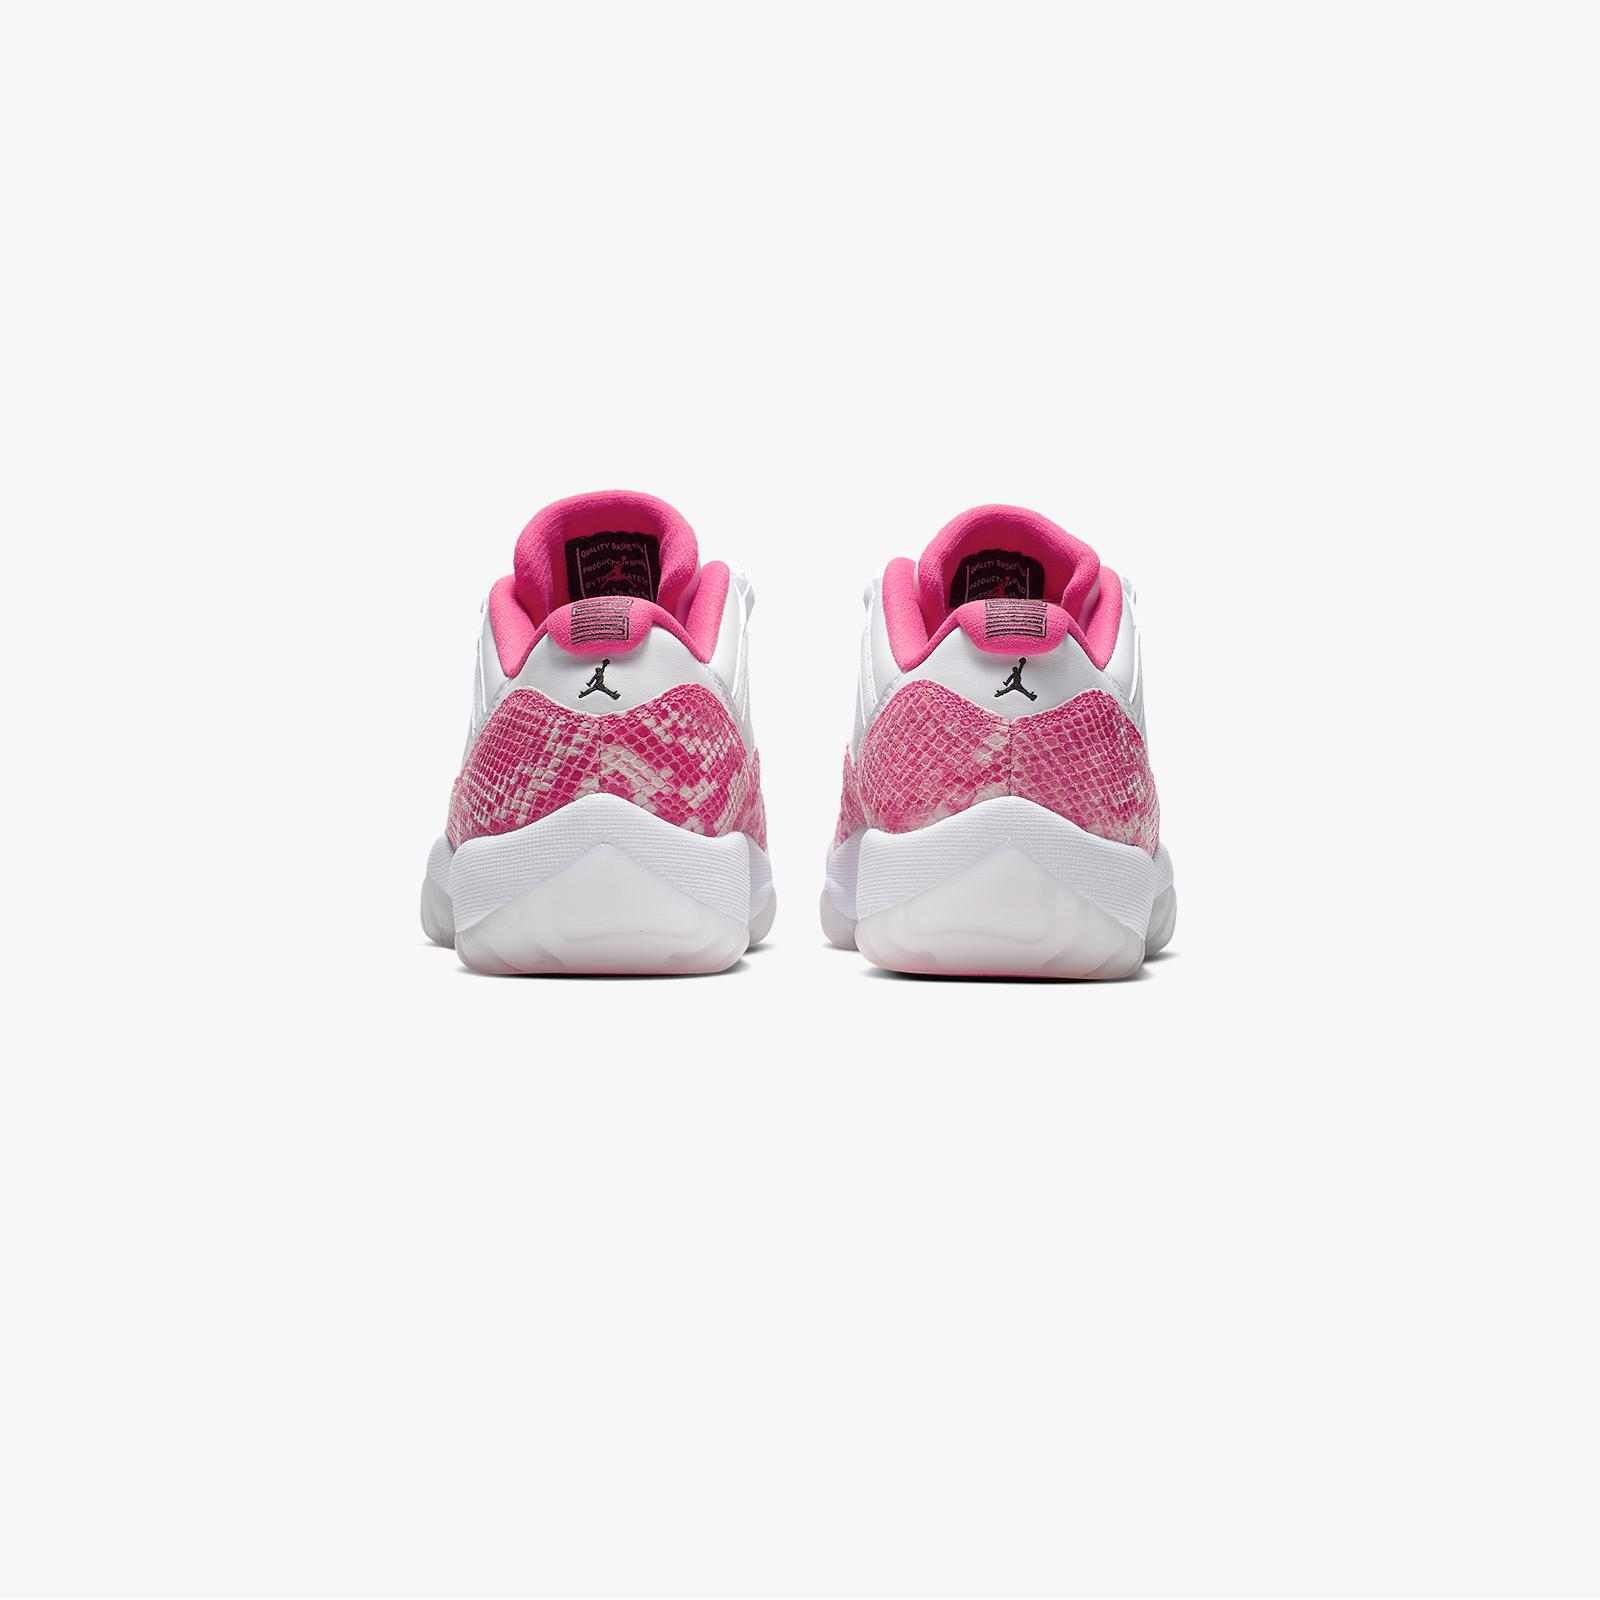 0fb148fbc56b0 Jordan Brand Wmns Air Jordan 11 Retro Low - Ah7860-106 - Sneakersnstuff |  sneakers & streetwear online since 1999